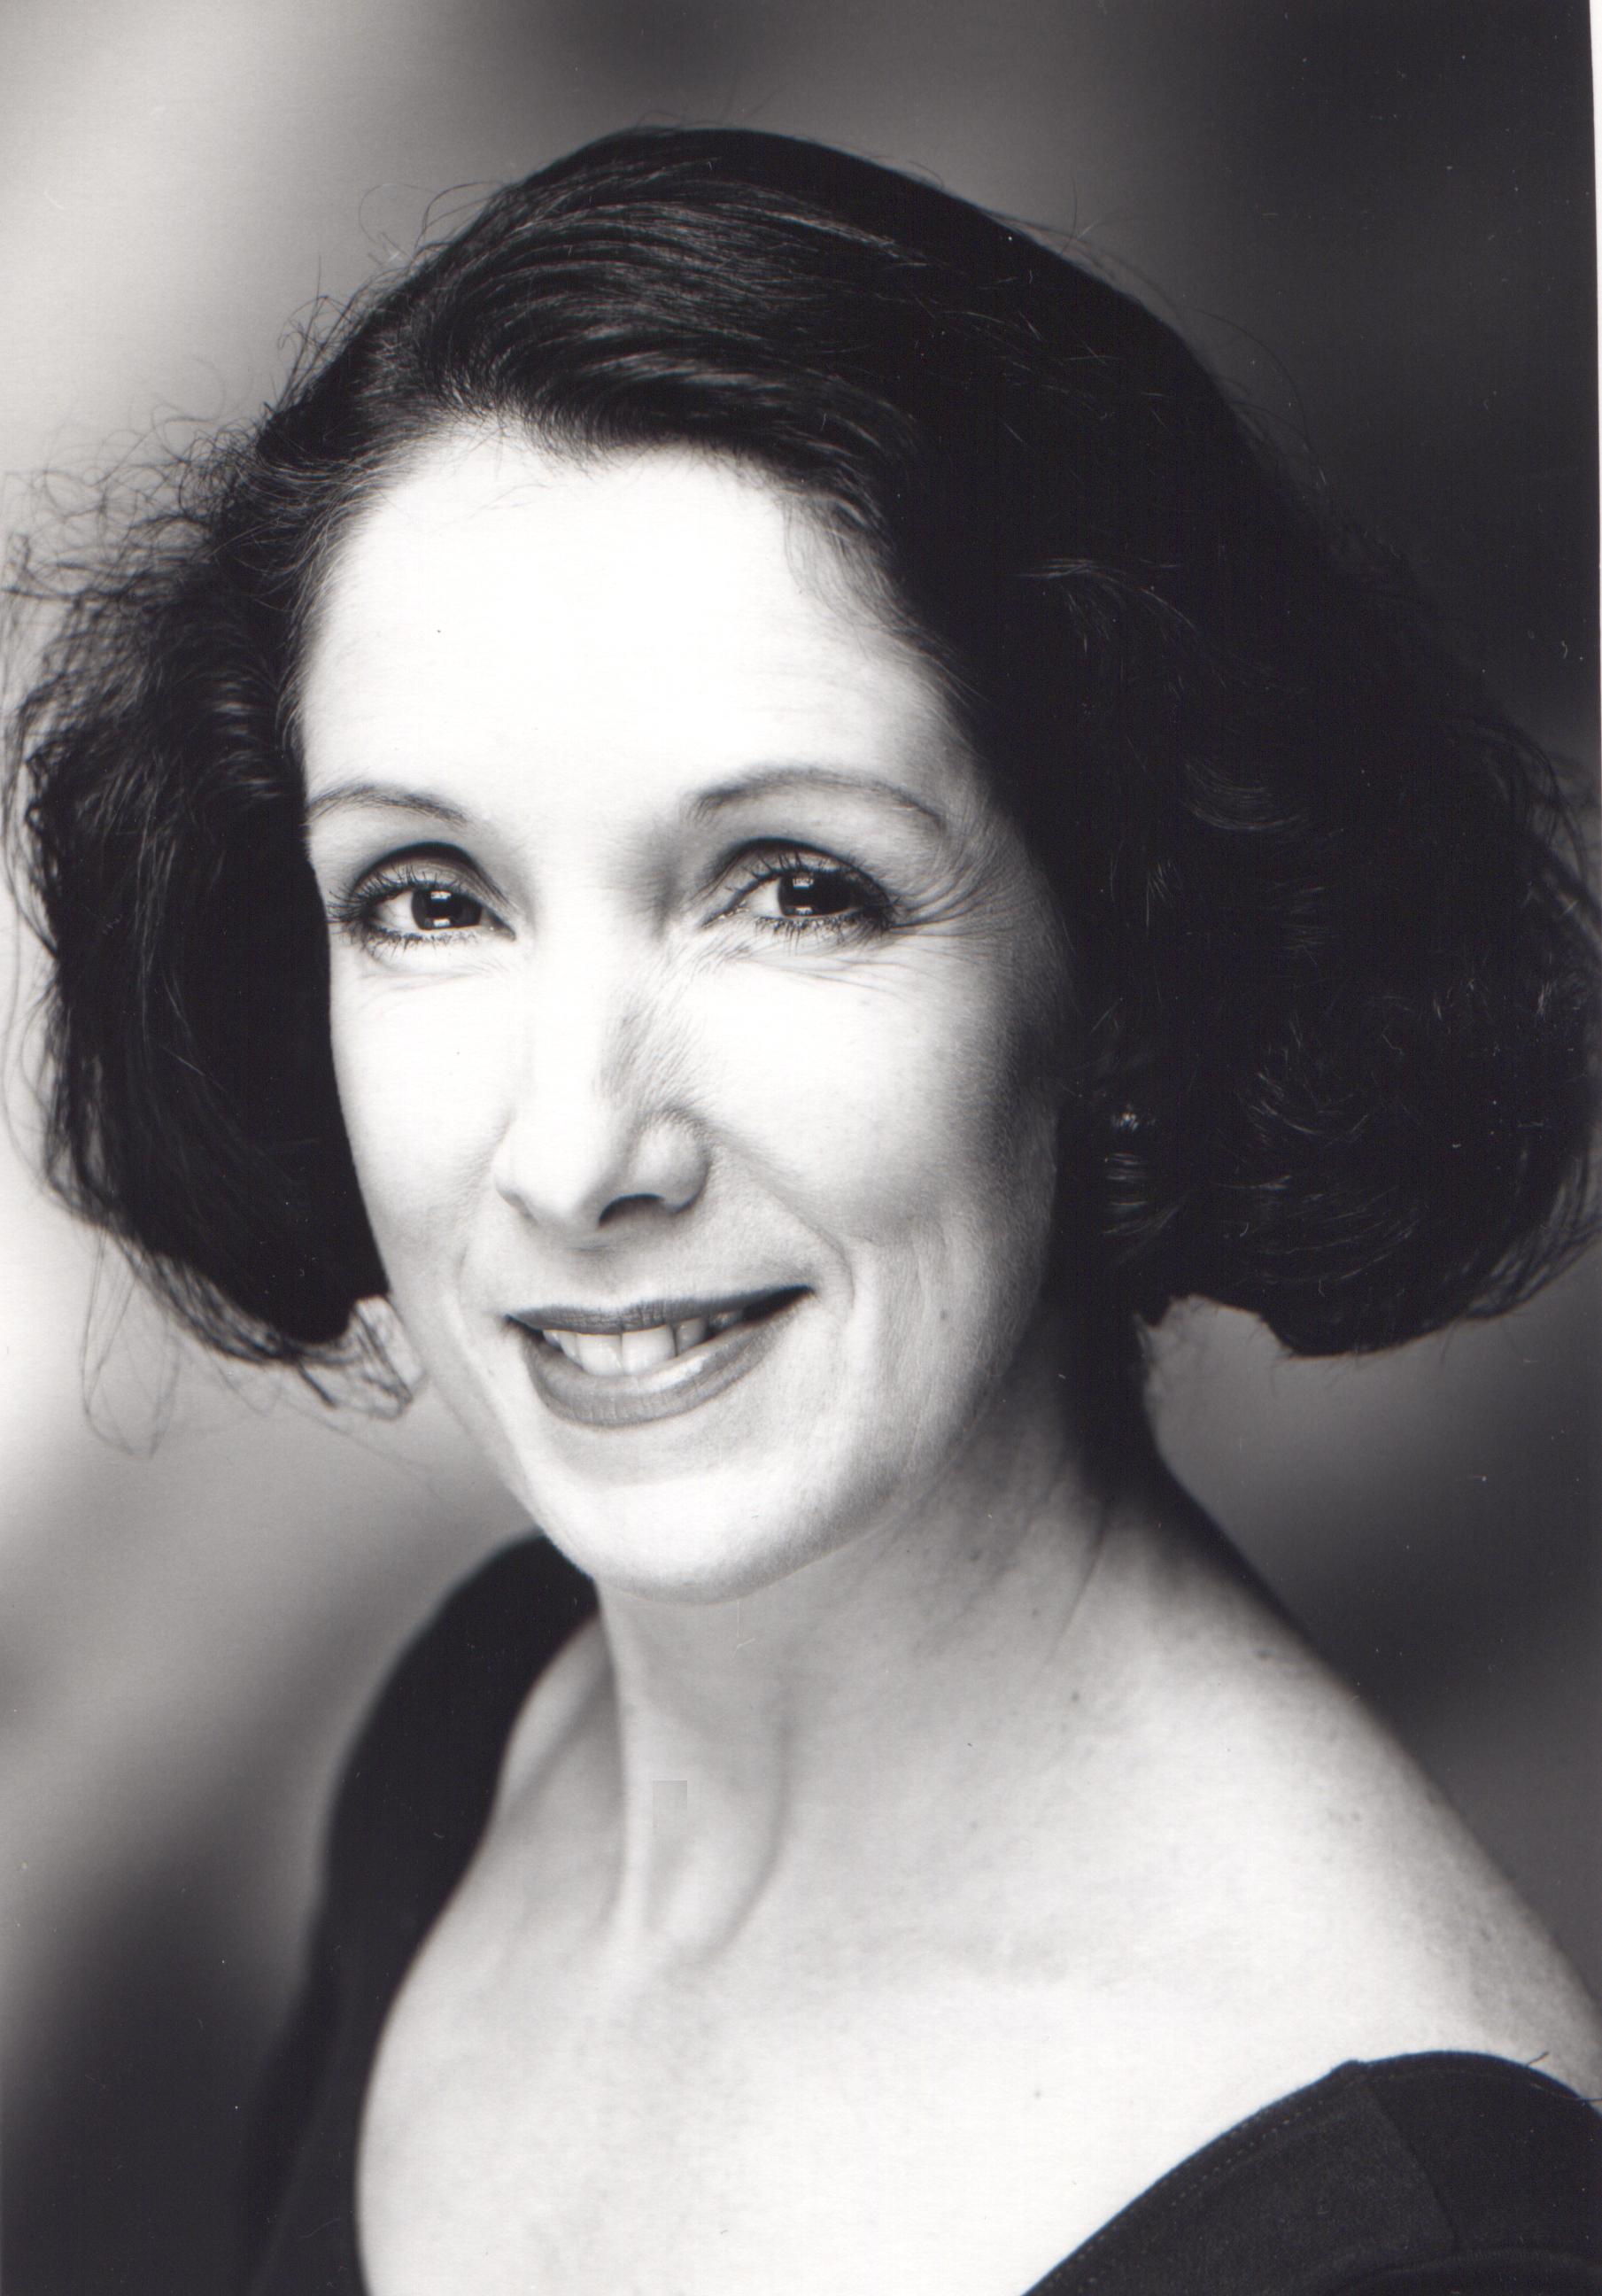 Anna du Boisson, classical ballet teacher at Danceworks in London